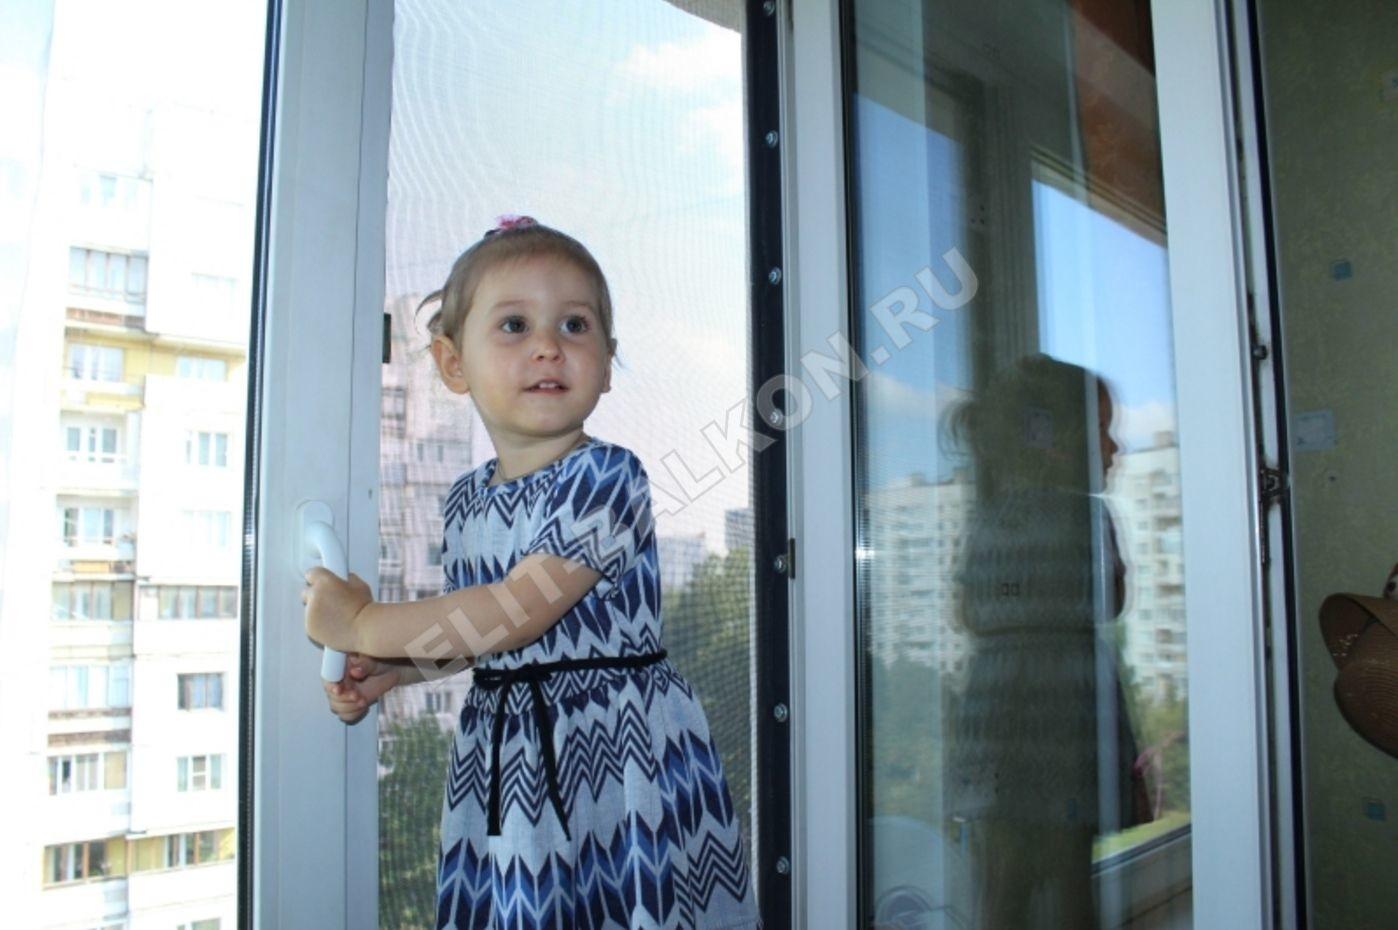 SETKA ANTIDETI NA OKNA PVH SANKT PETERBURG MOSKVA USTANOVLENA 4 1 - Фурнитура защита от детей